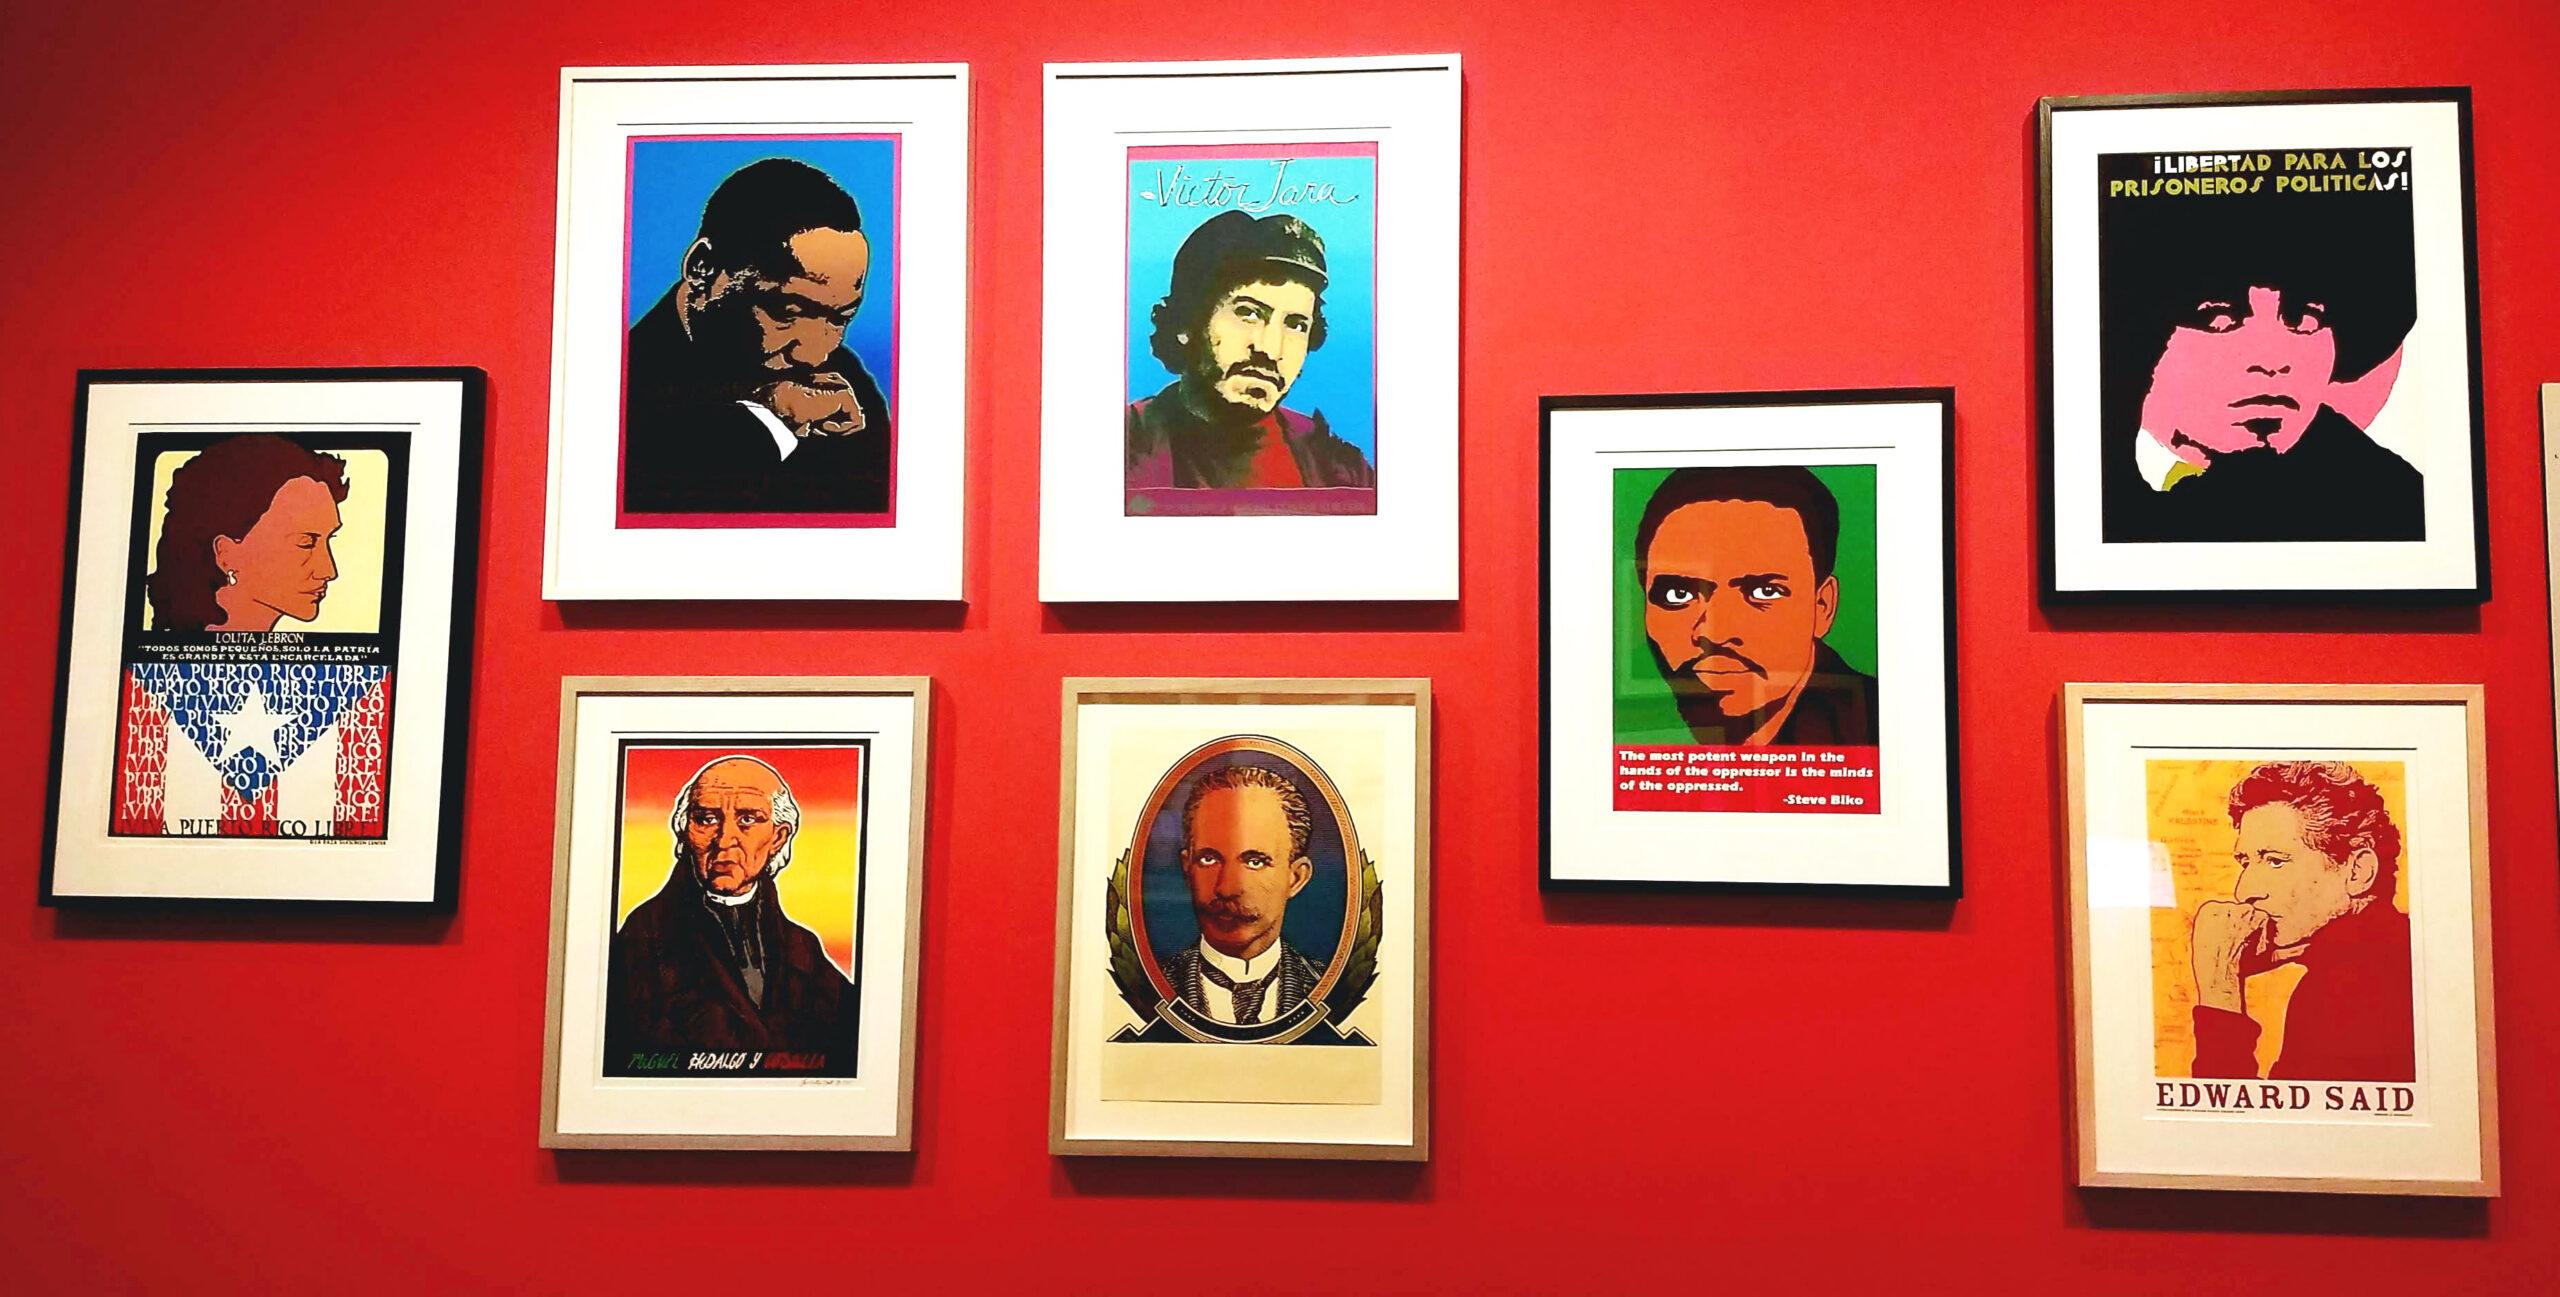 a red museum wall with silkscreened portraits of Lolita Le Born, Angela Davis, MLK, José Martí, Victor Jara, Edward Said and Miguel Hidalgo de Costilla